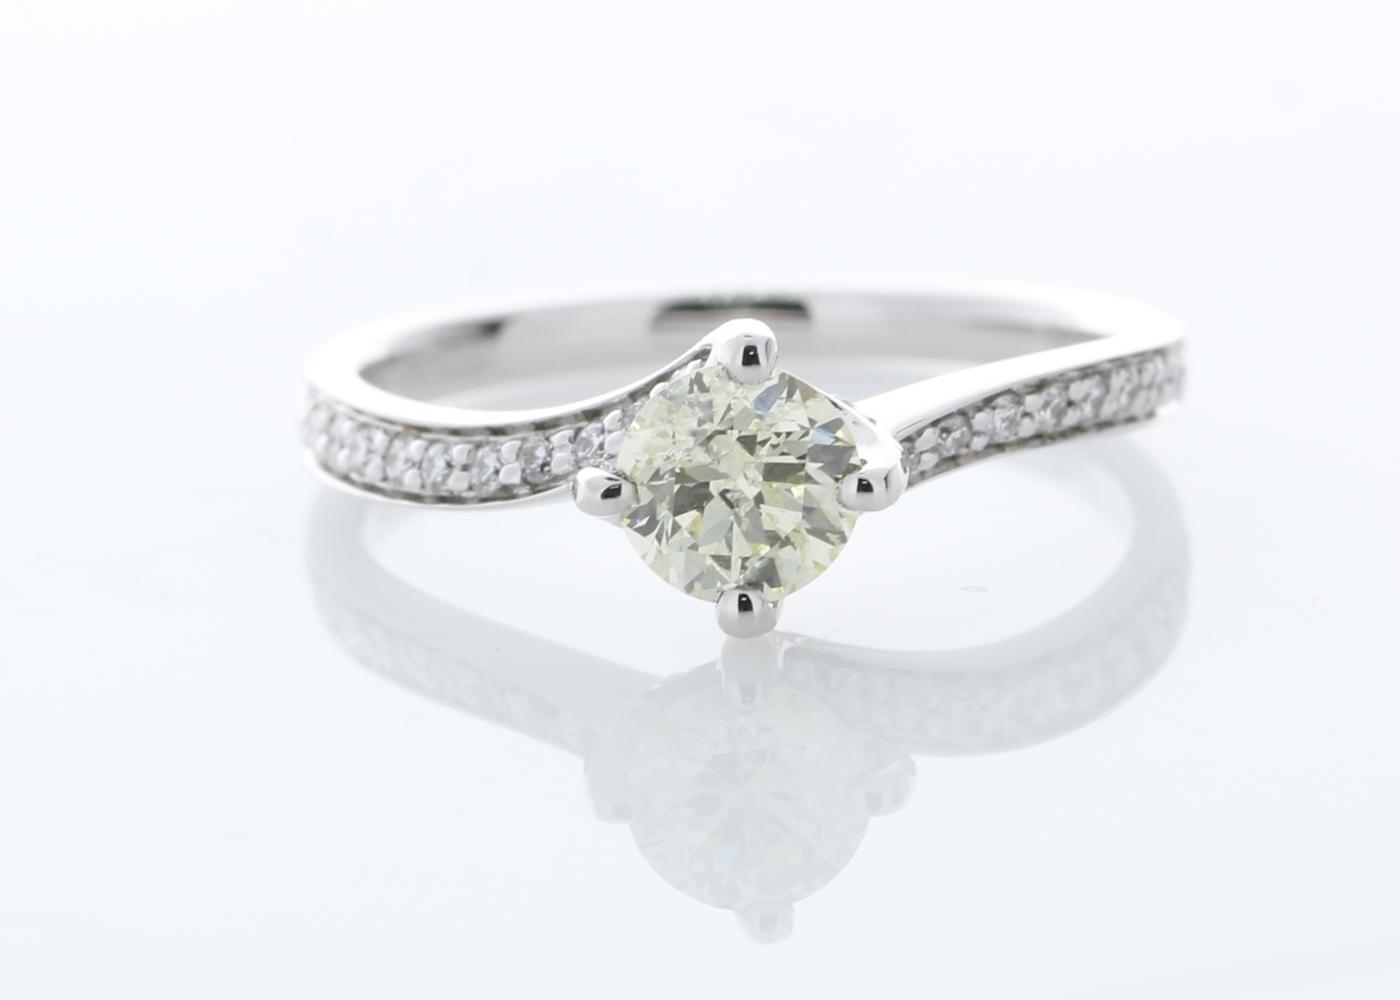 Lot 19 - 18ct White Gold Diamond set Shoulders Ring 0.72 Carats